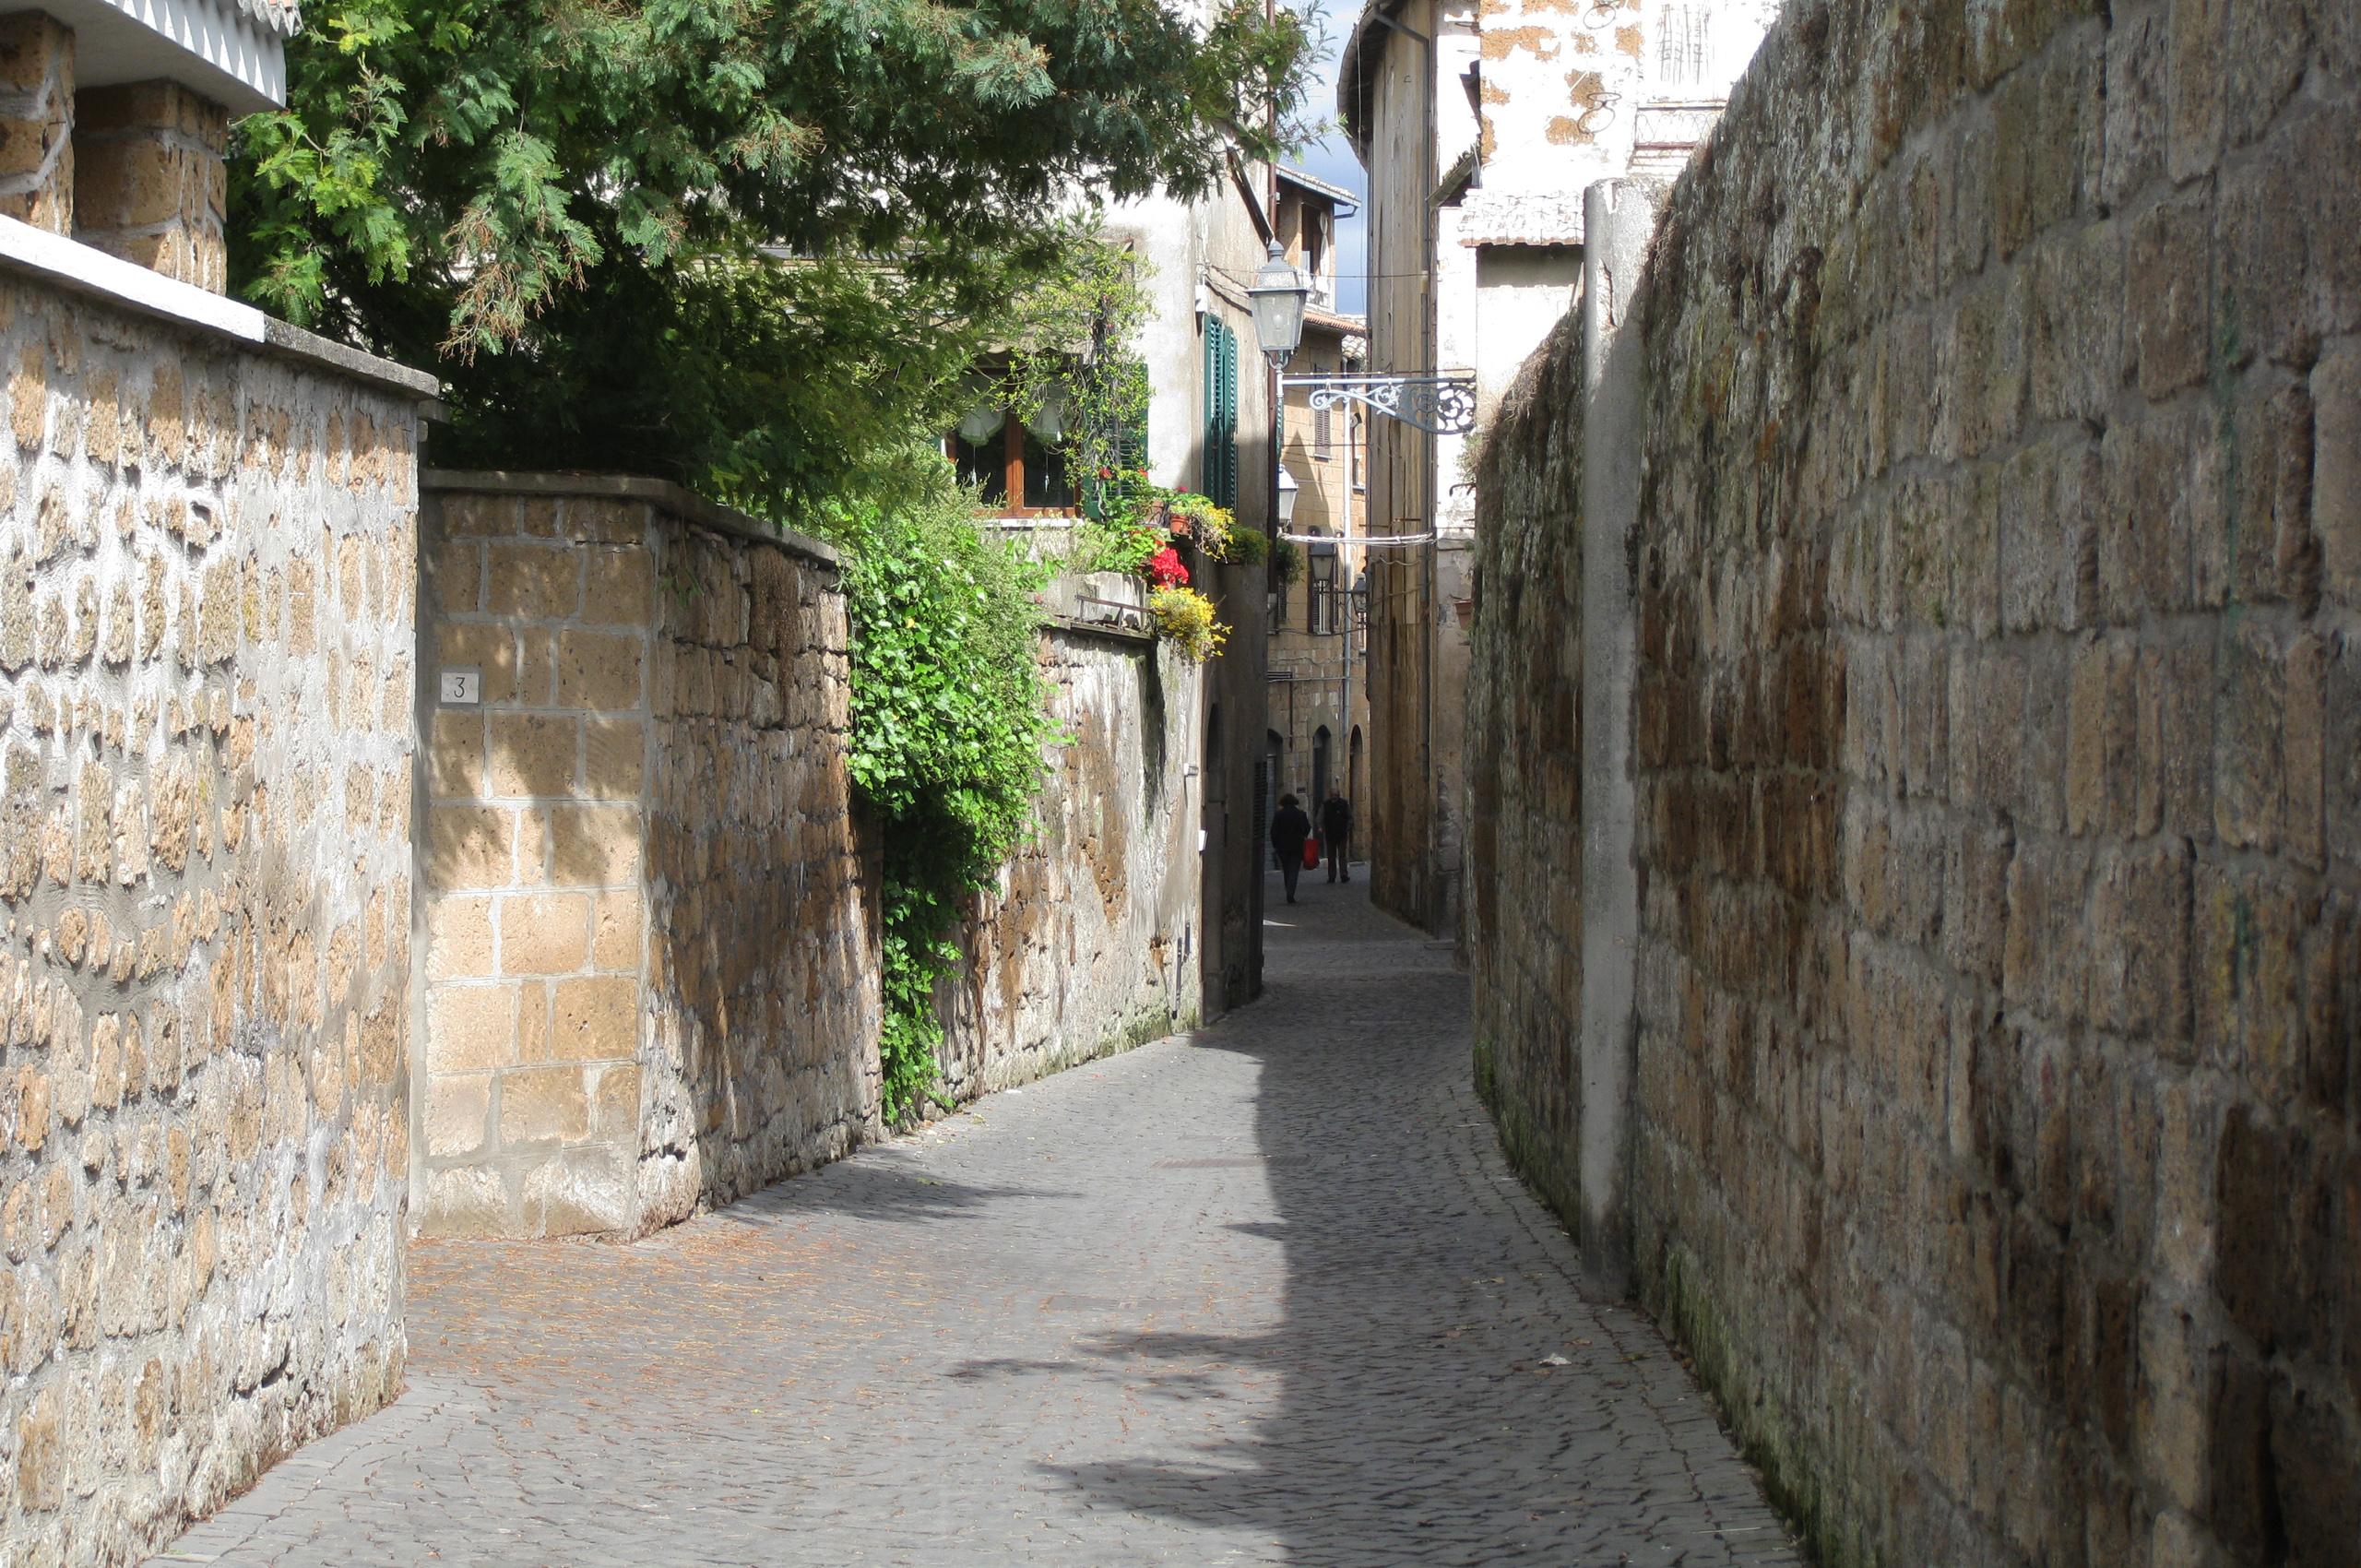 File:Orvieto cobblestone street.jpg